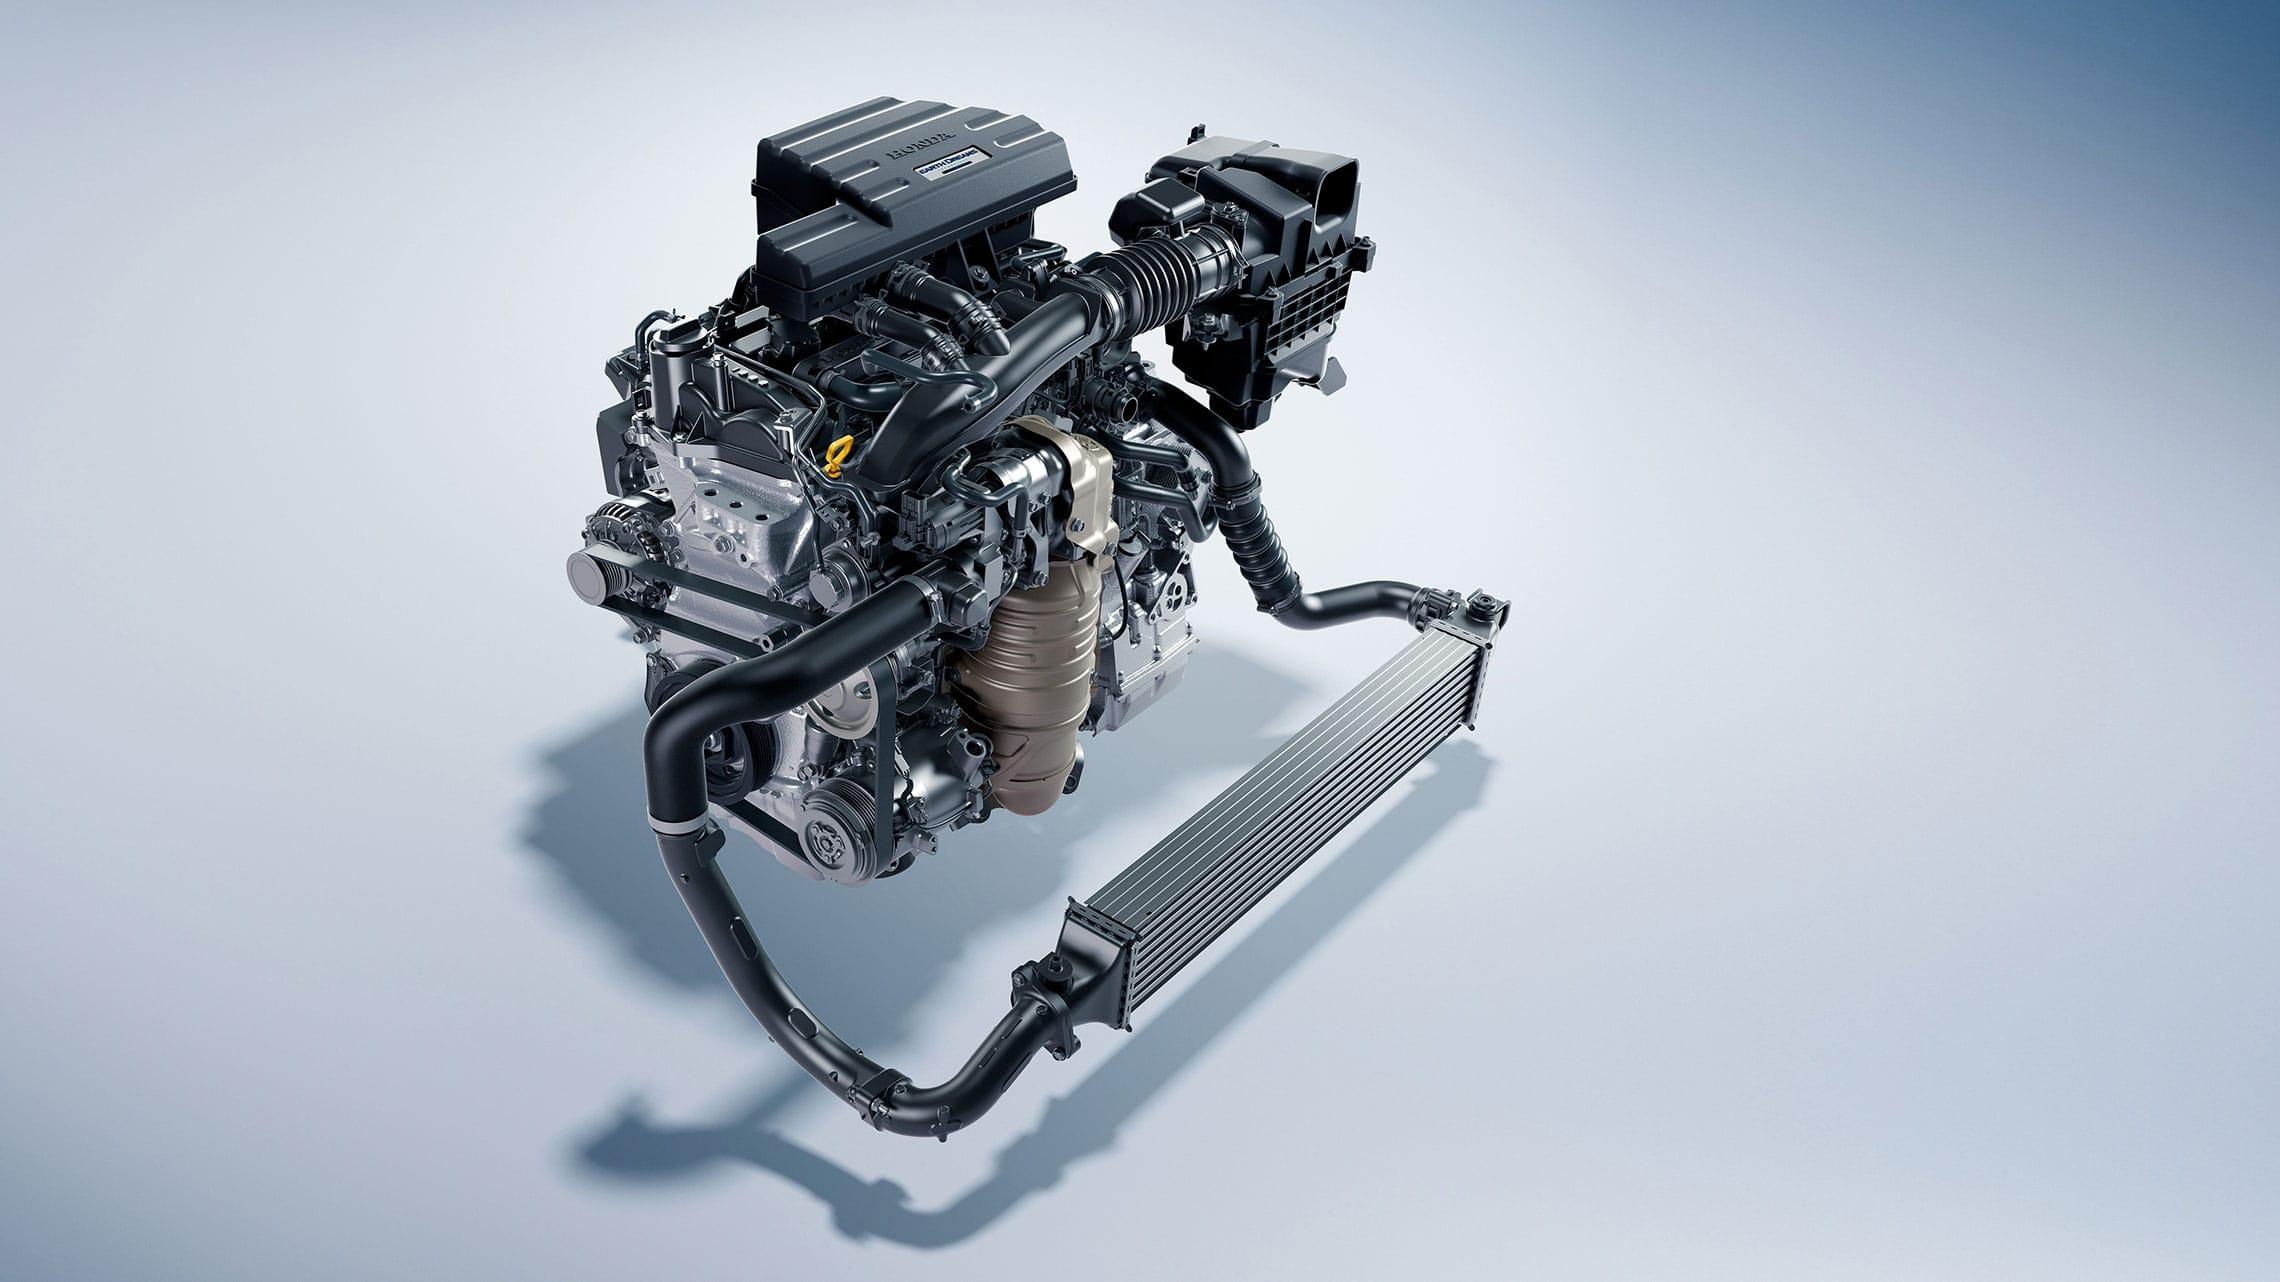 Detalle del motor turboalimentado de 1.5litros en la Honda CR-V2021.